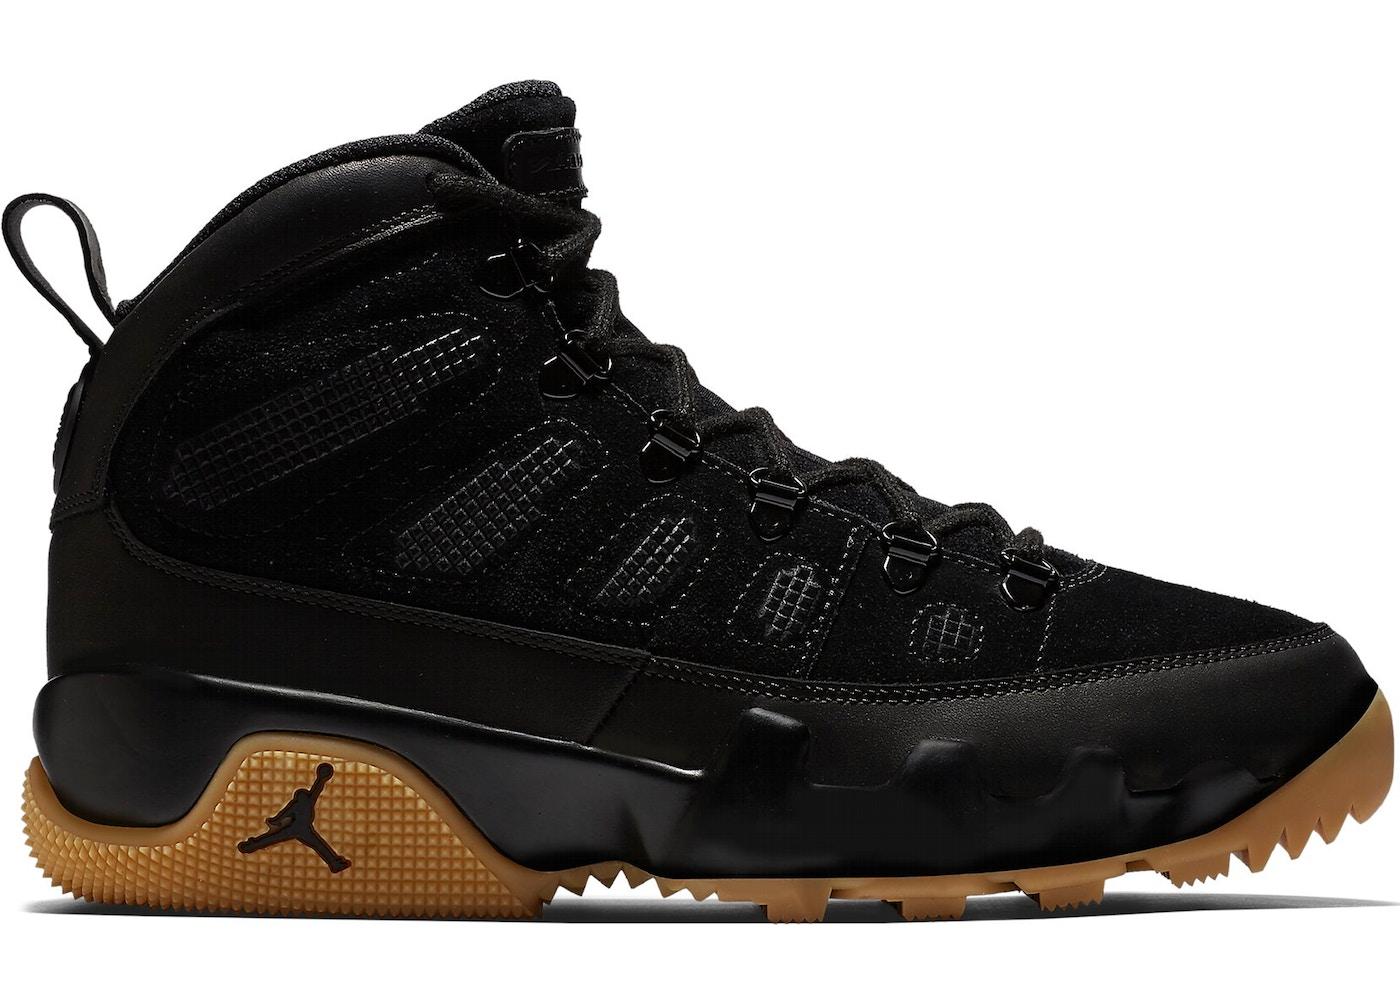 finest selection 66ed2 0b4f2 Jordan 9 Retro Boot Black Gum